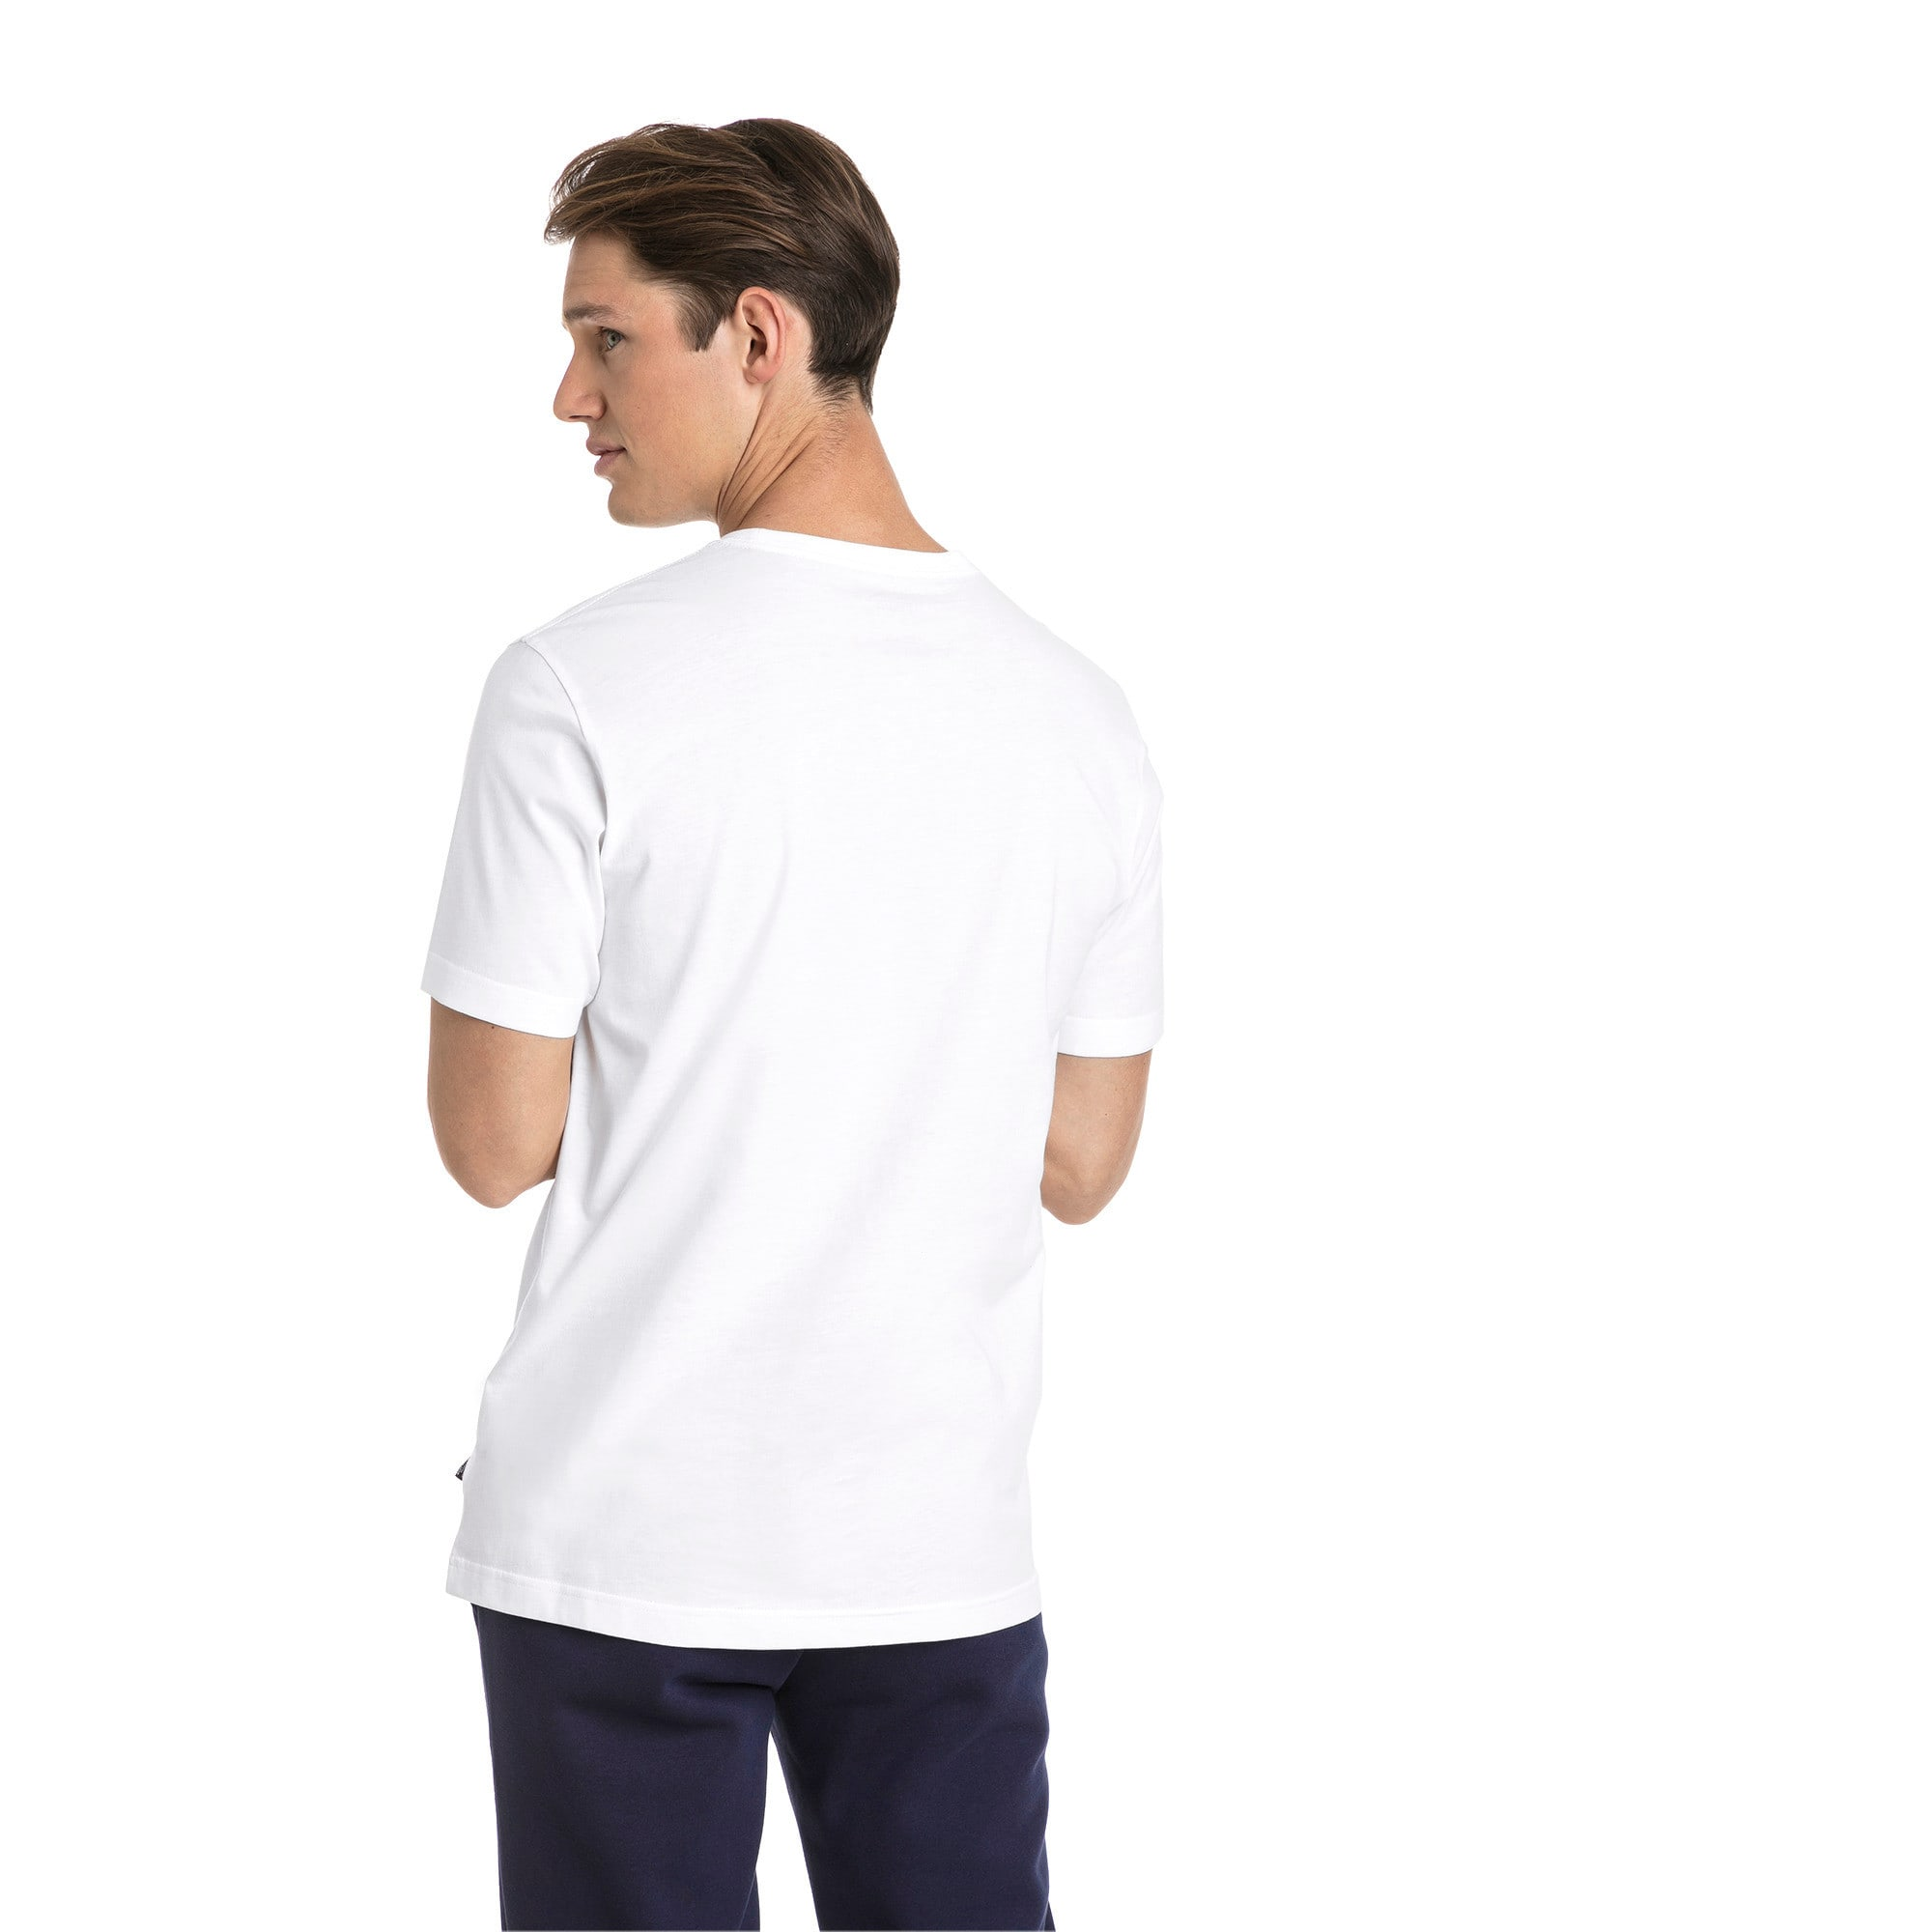 Thumbnail 2 of T-shirt con logo piccolo Essentials uomo, Puma White-_Cat, medium